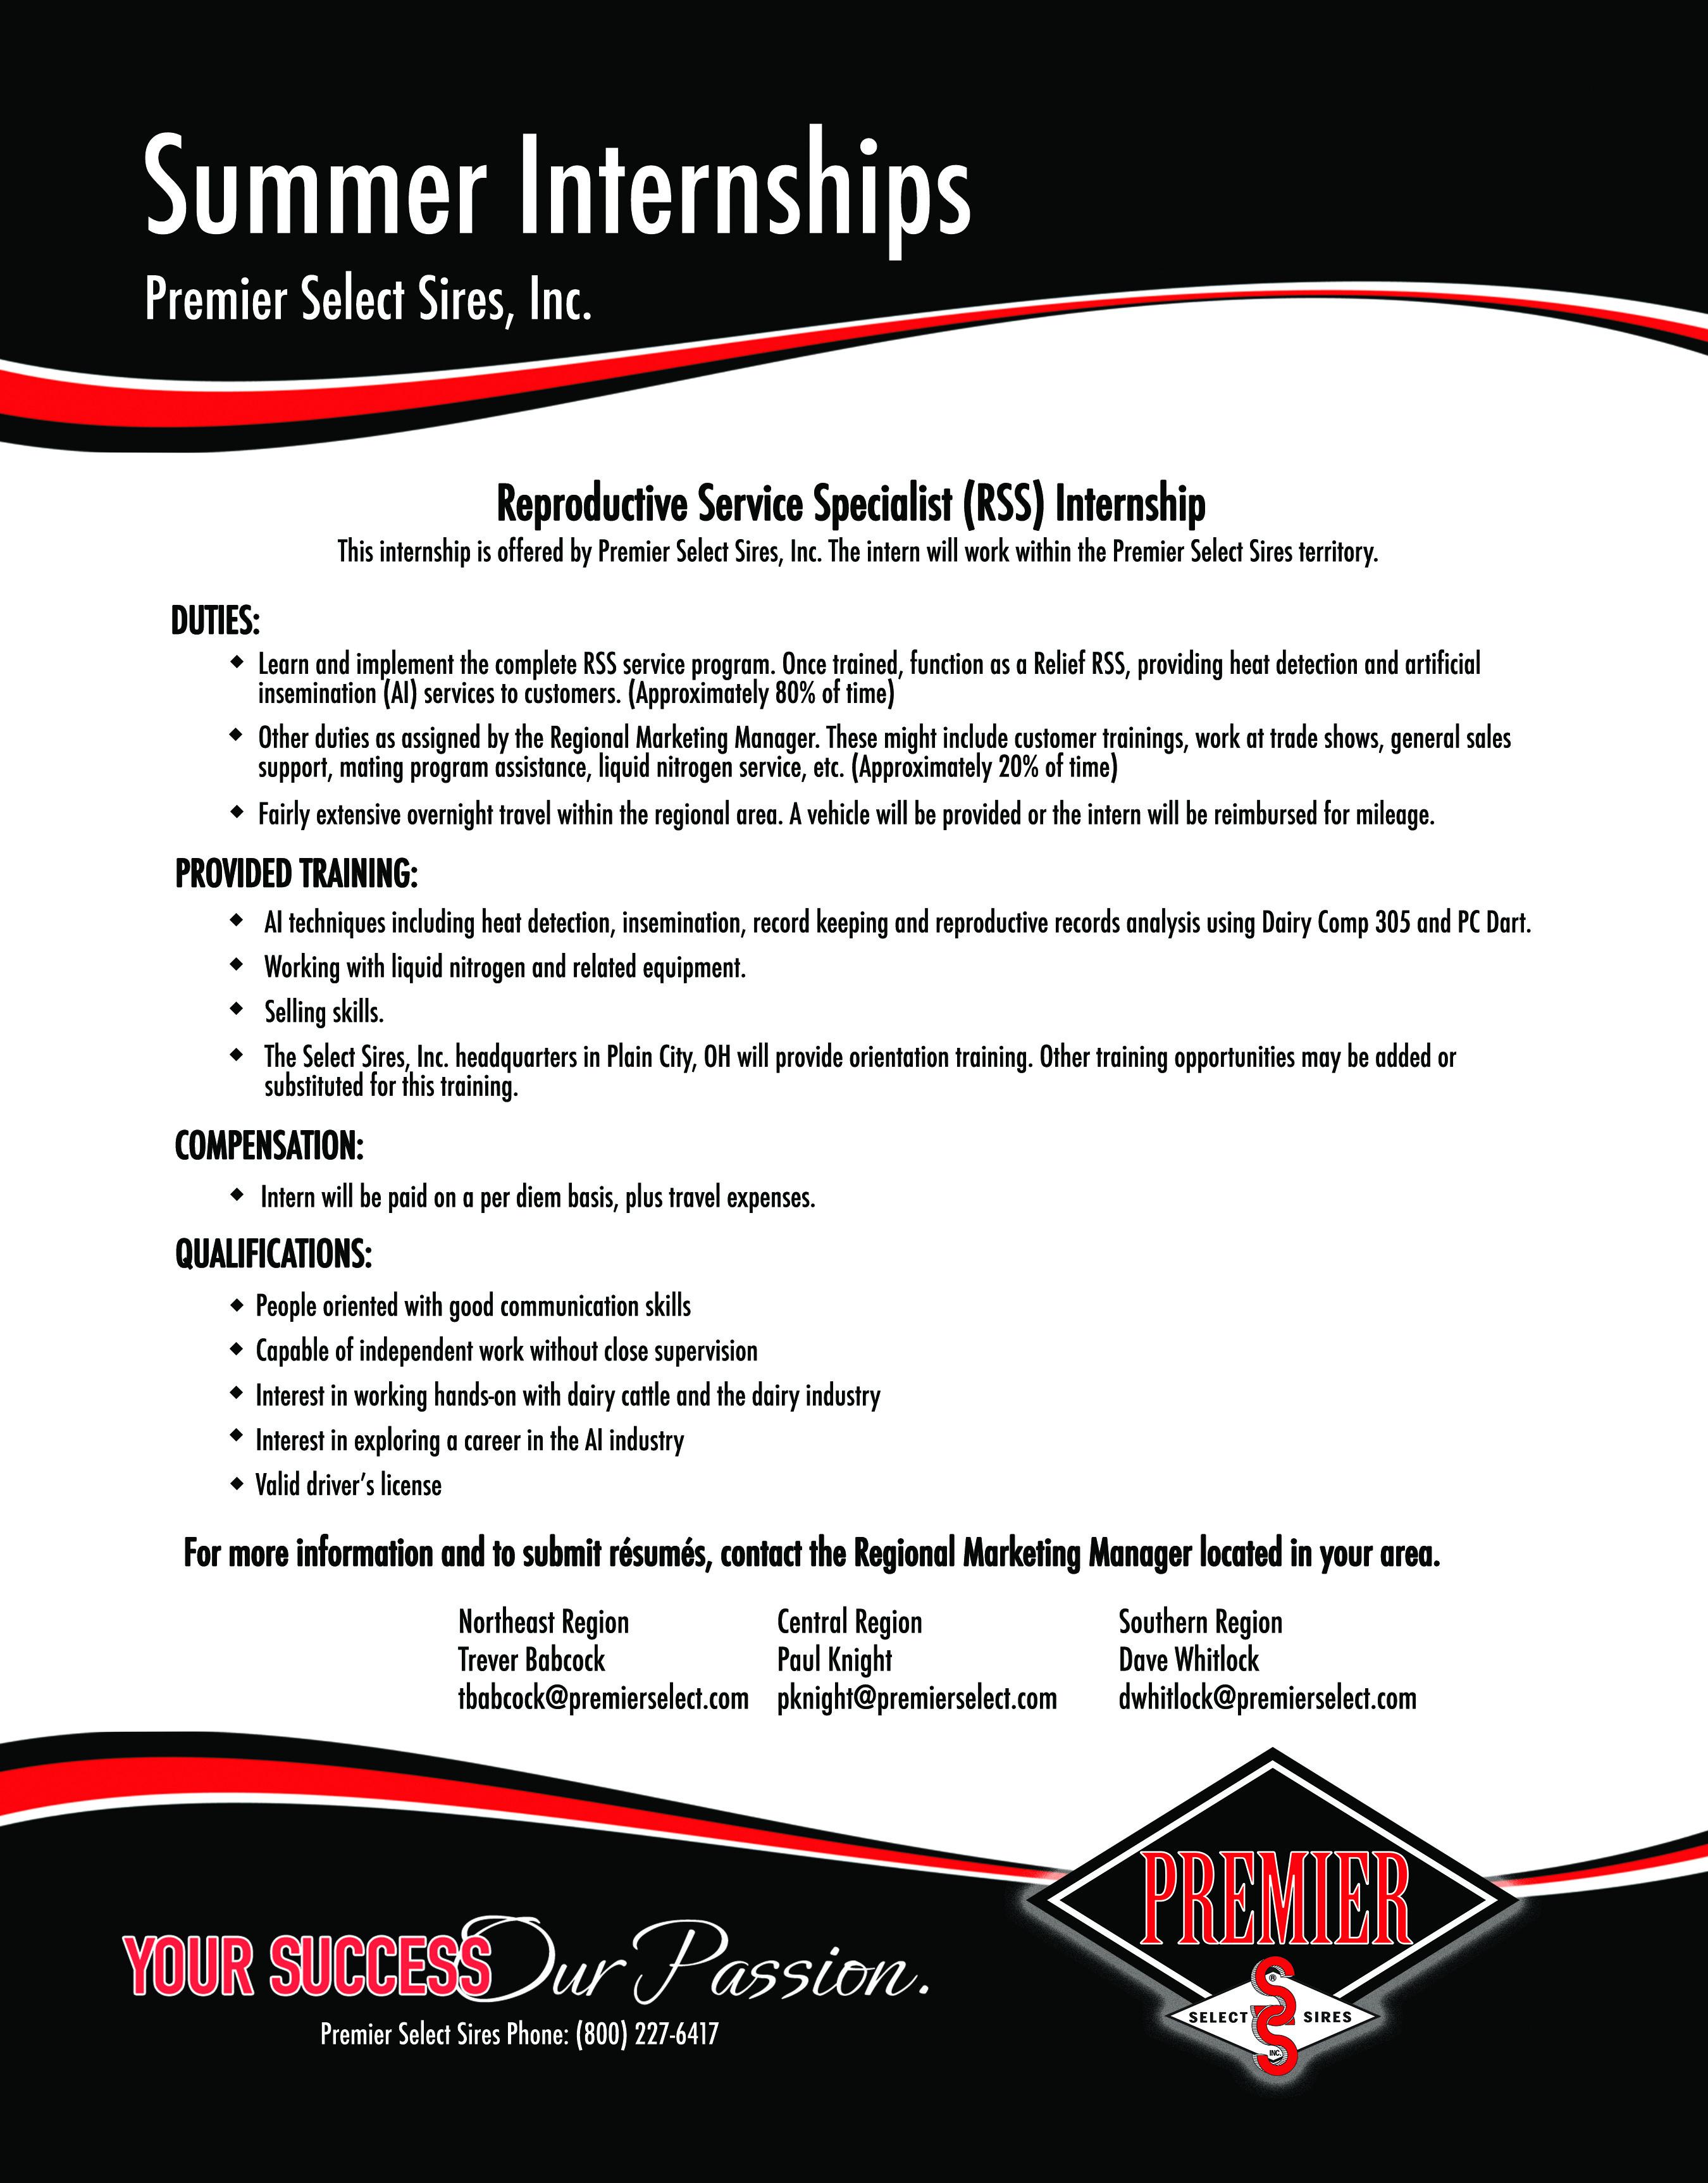 PSS Internship Flyer